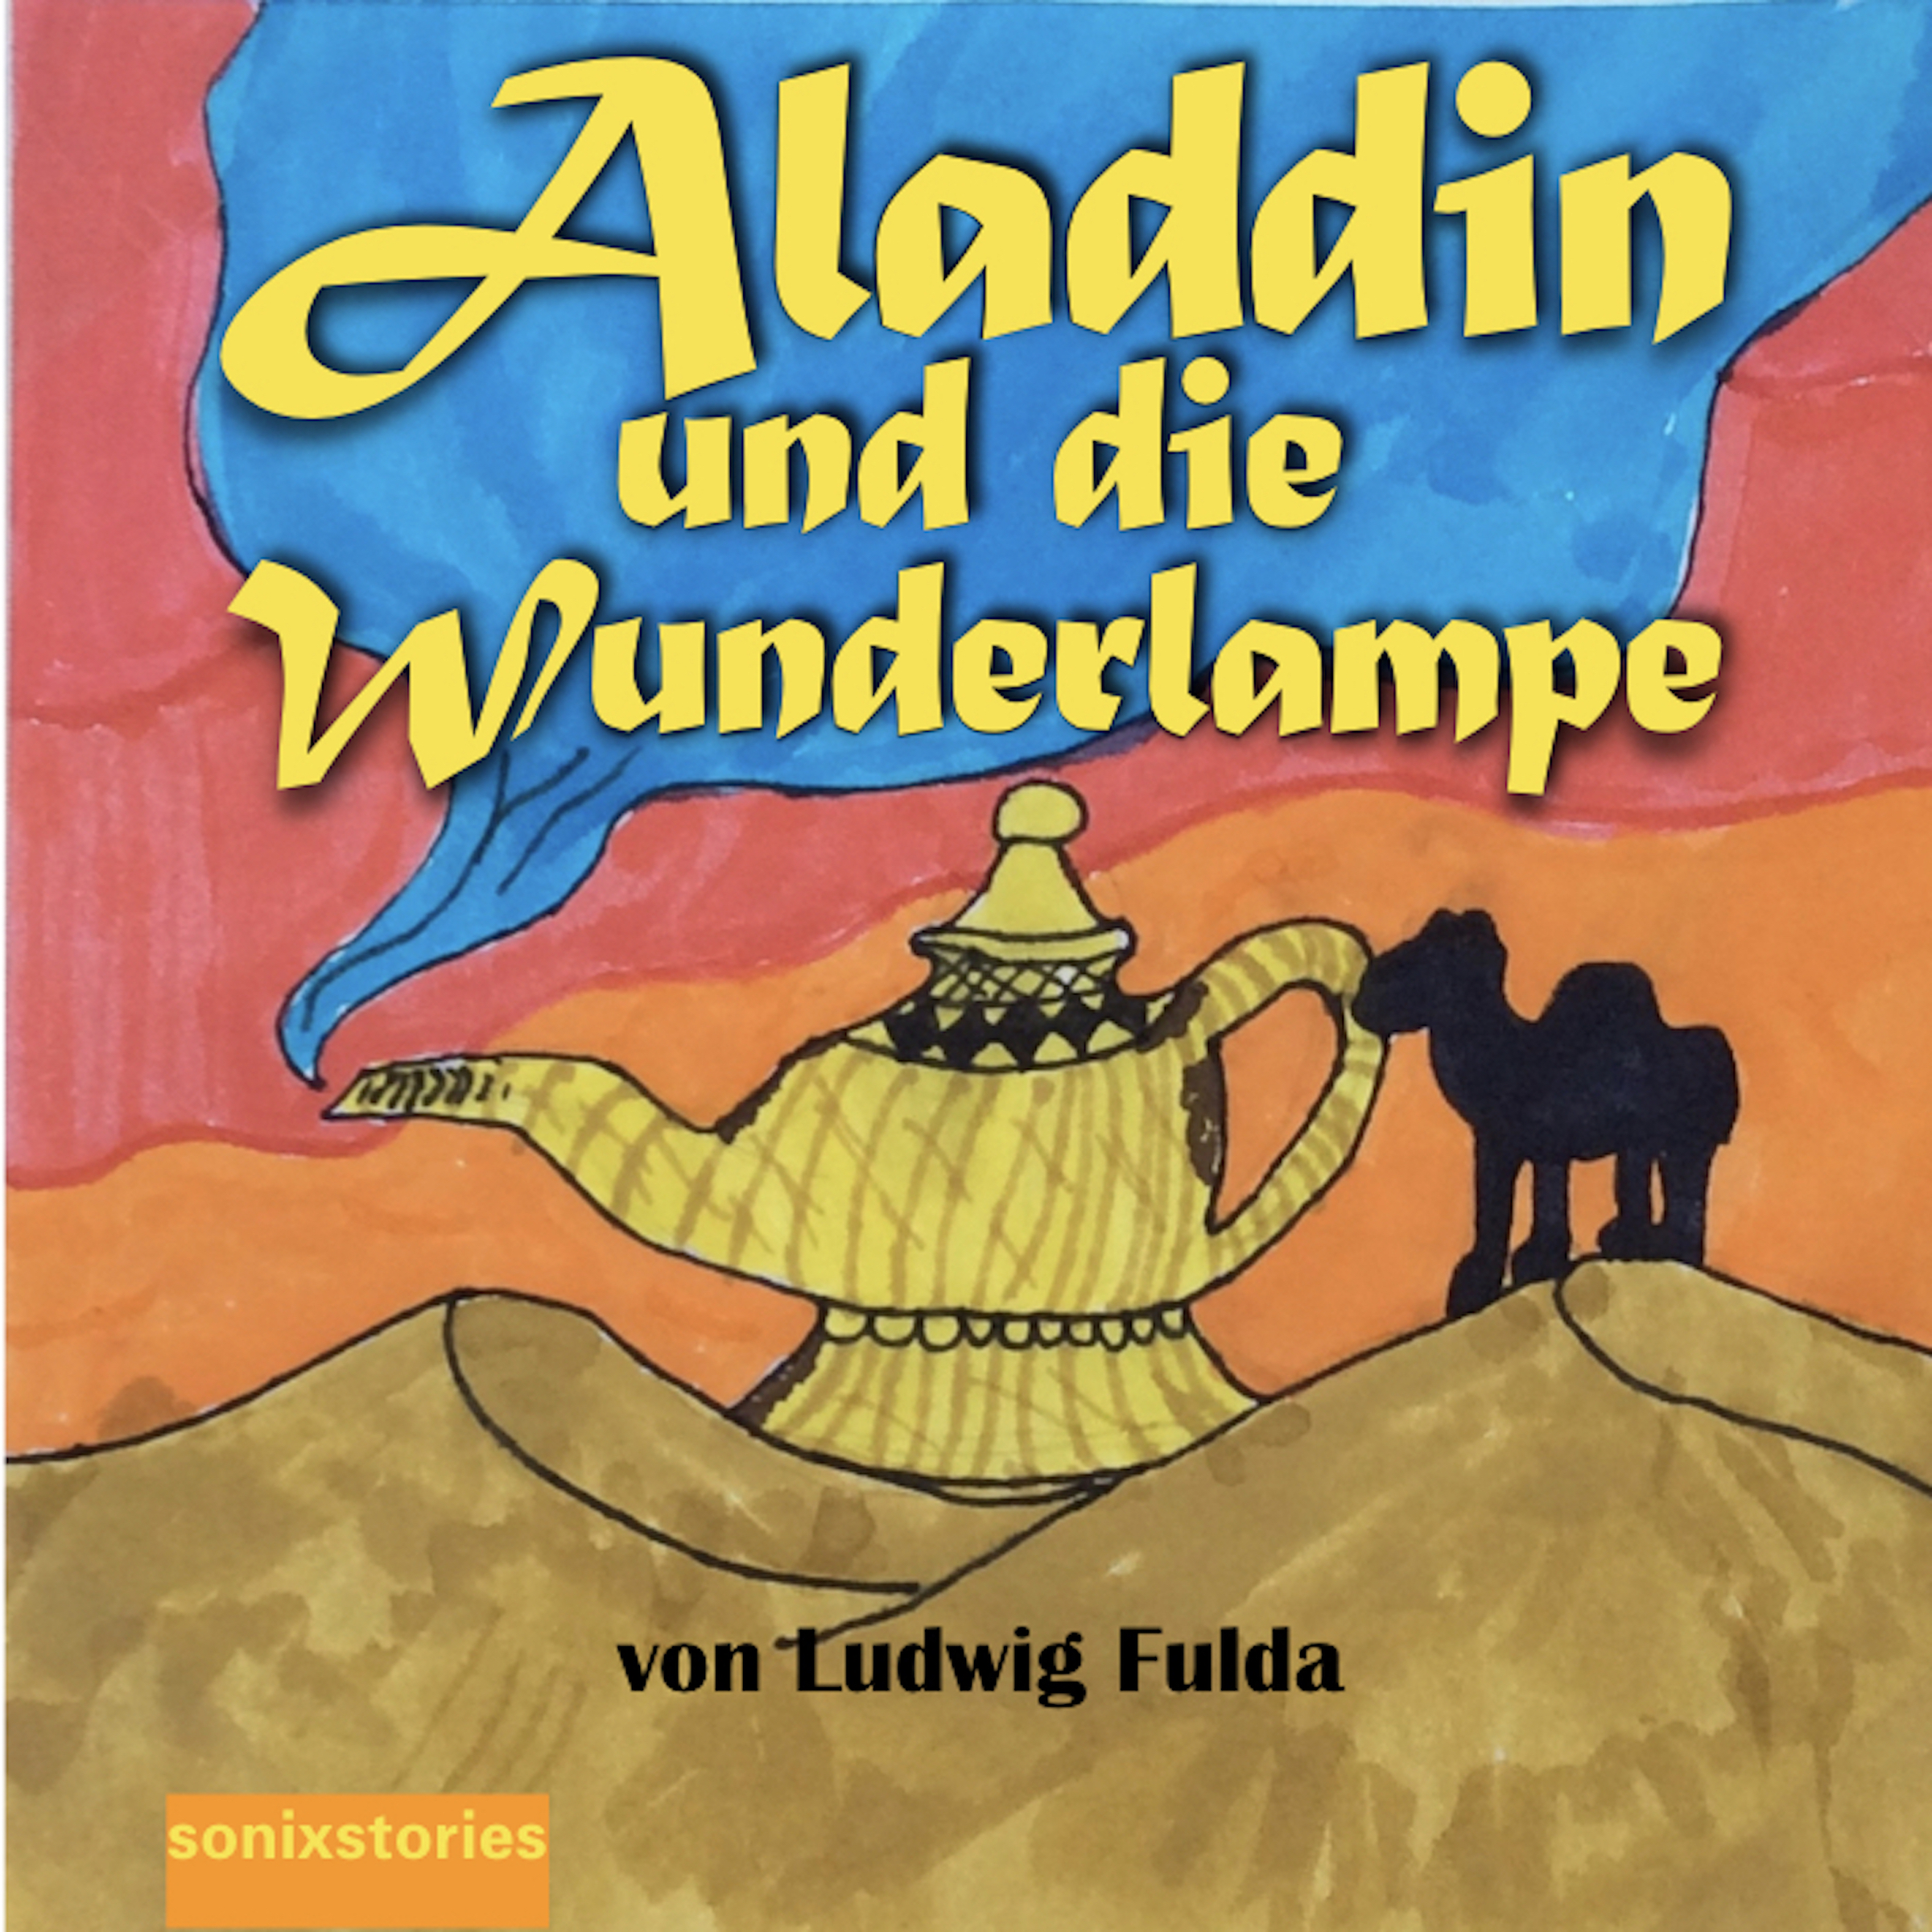 Aladdin_Cover_3_höhere_Auflösung